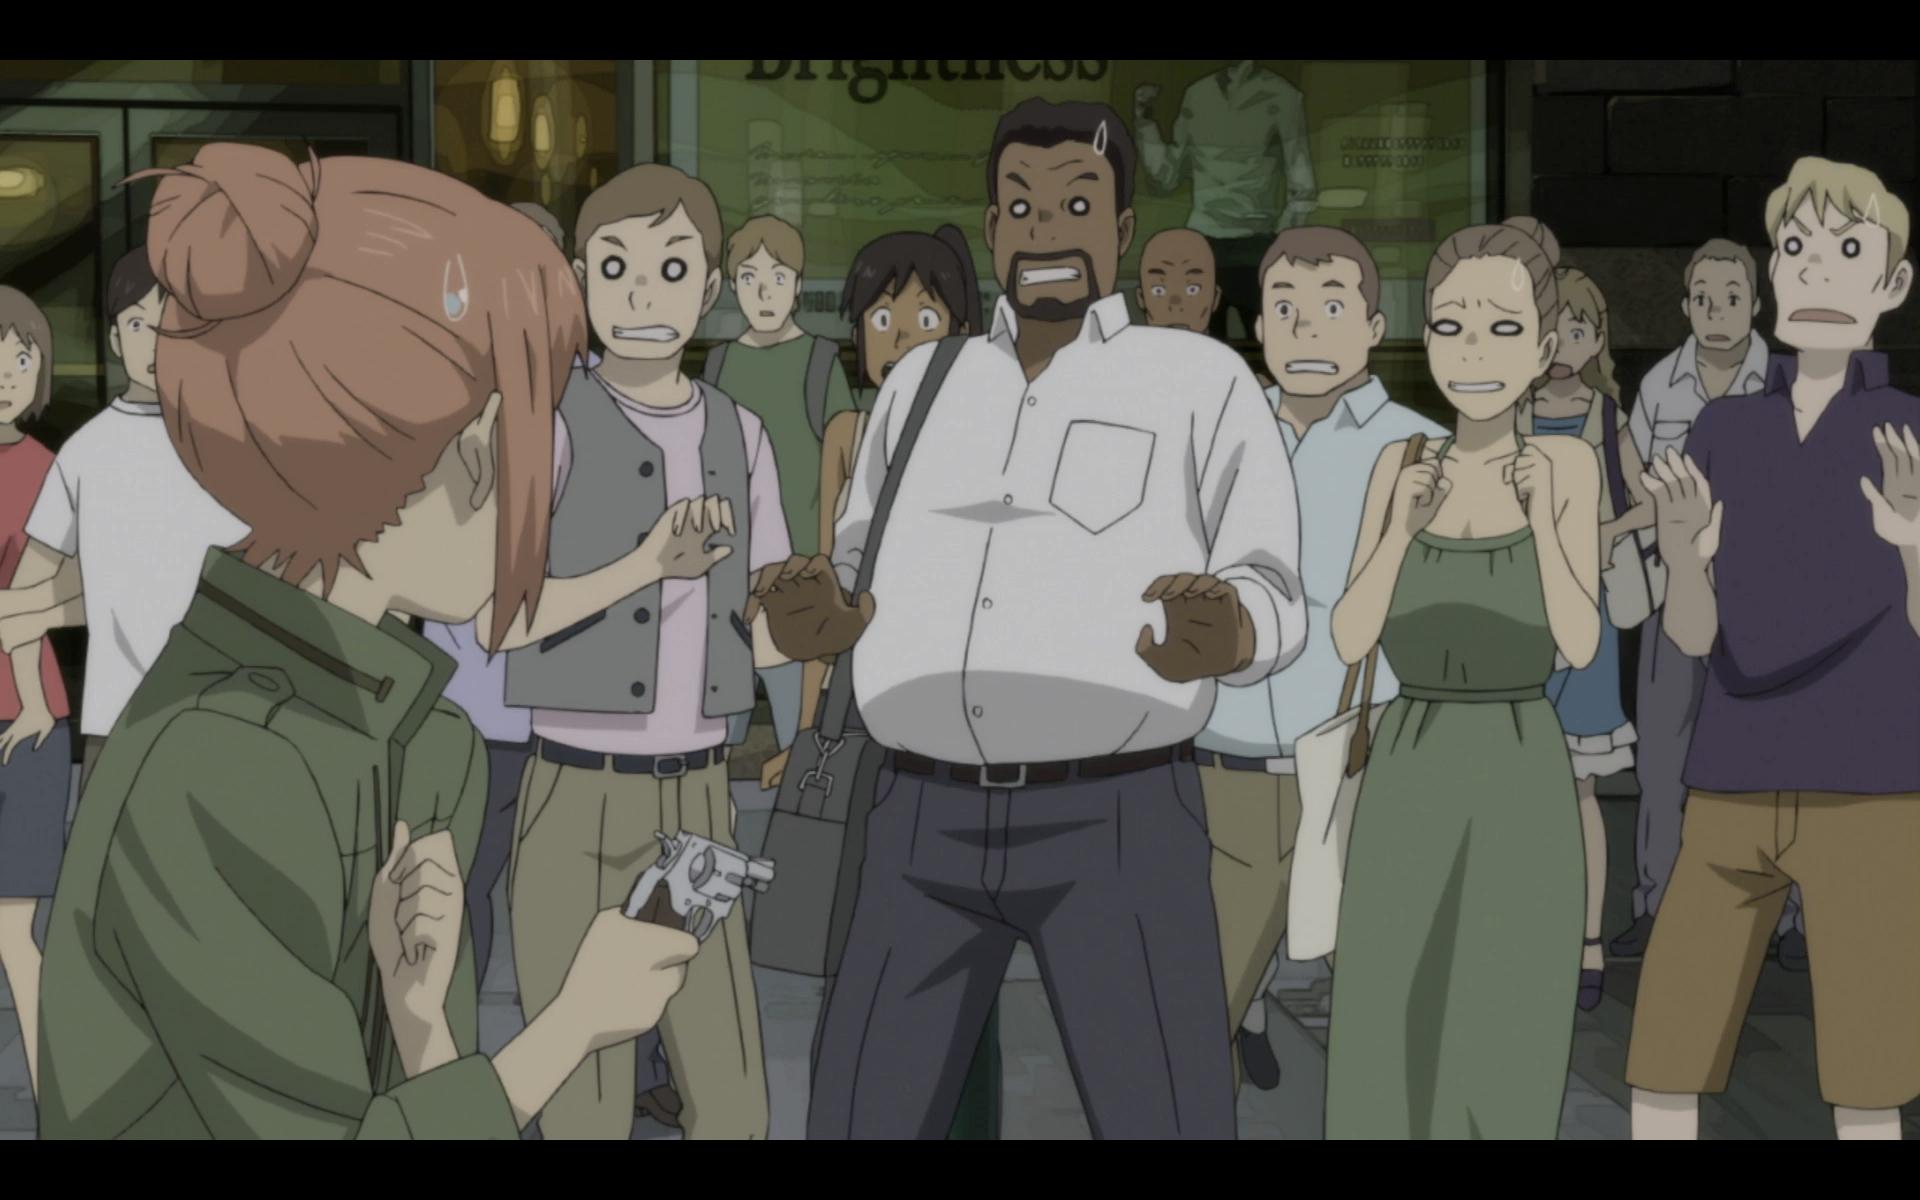 eden-of-the-east-movie-1-screenshot-2.jpg